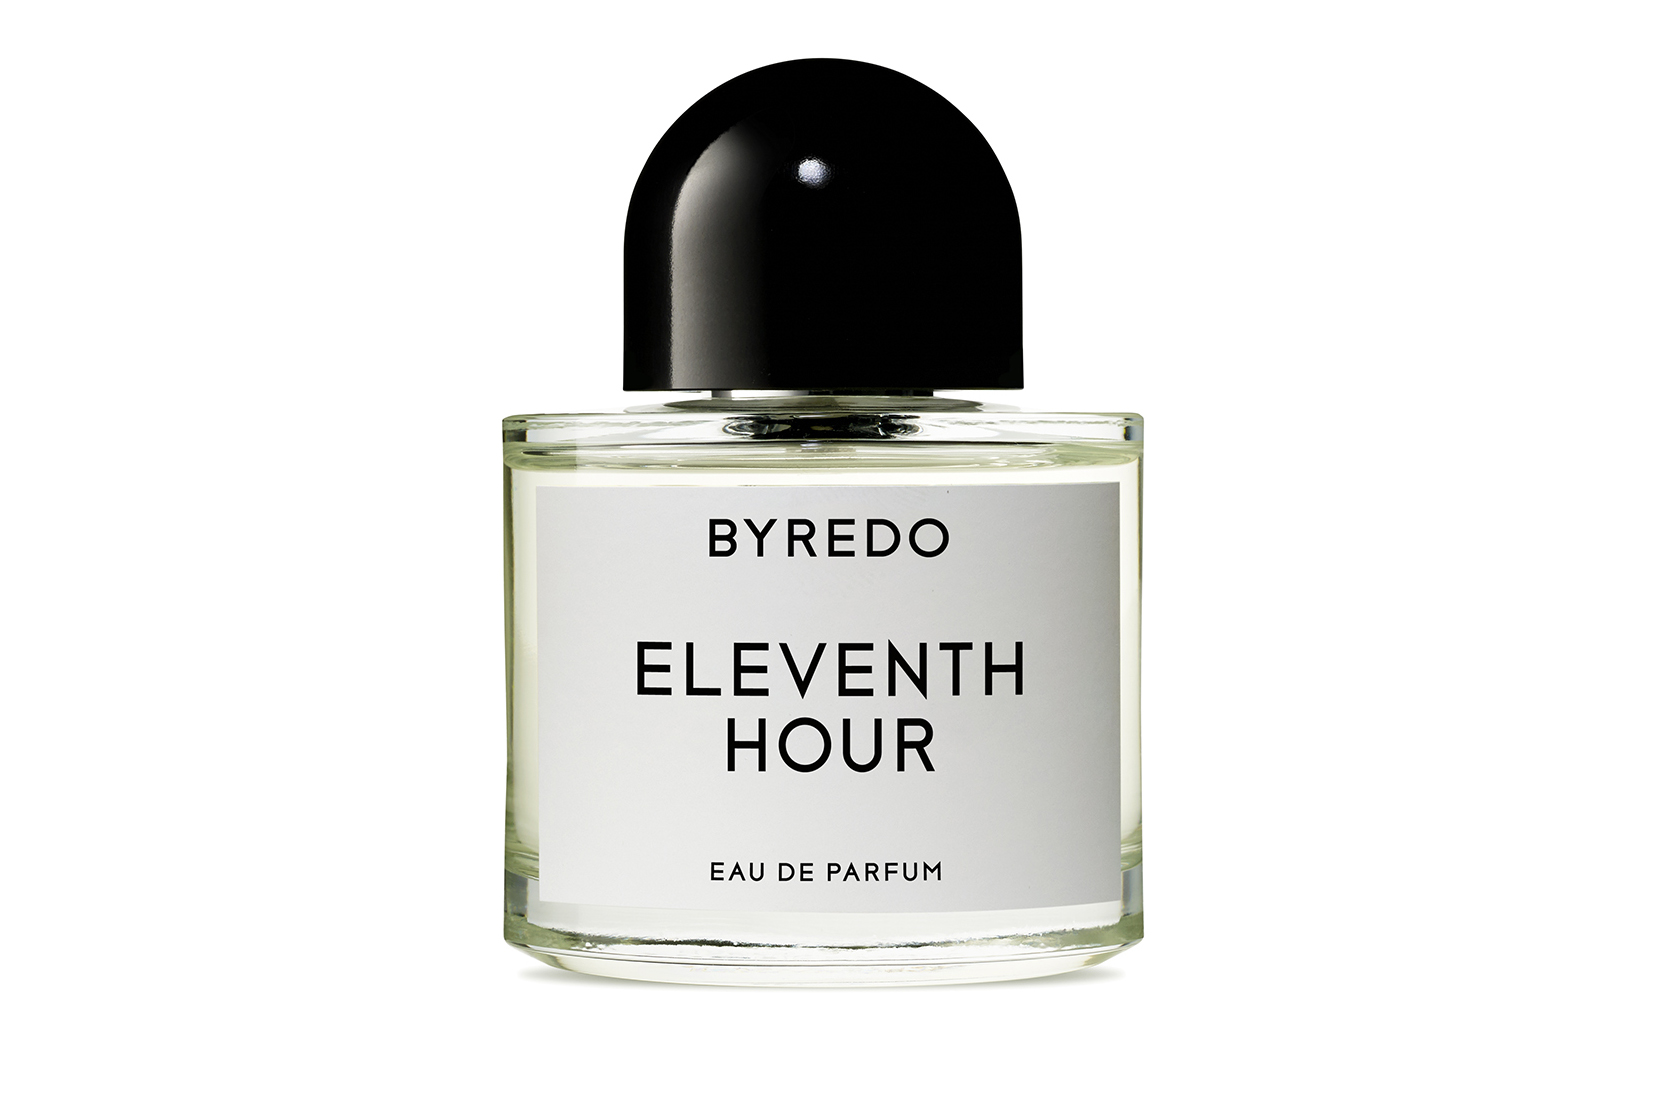 Byredo Eleventh Hour